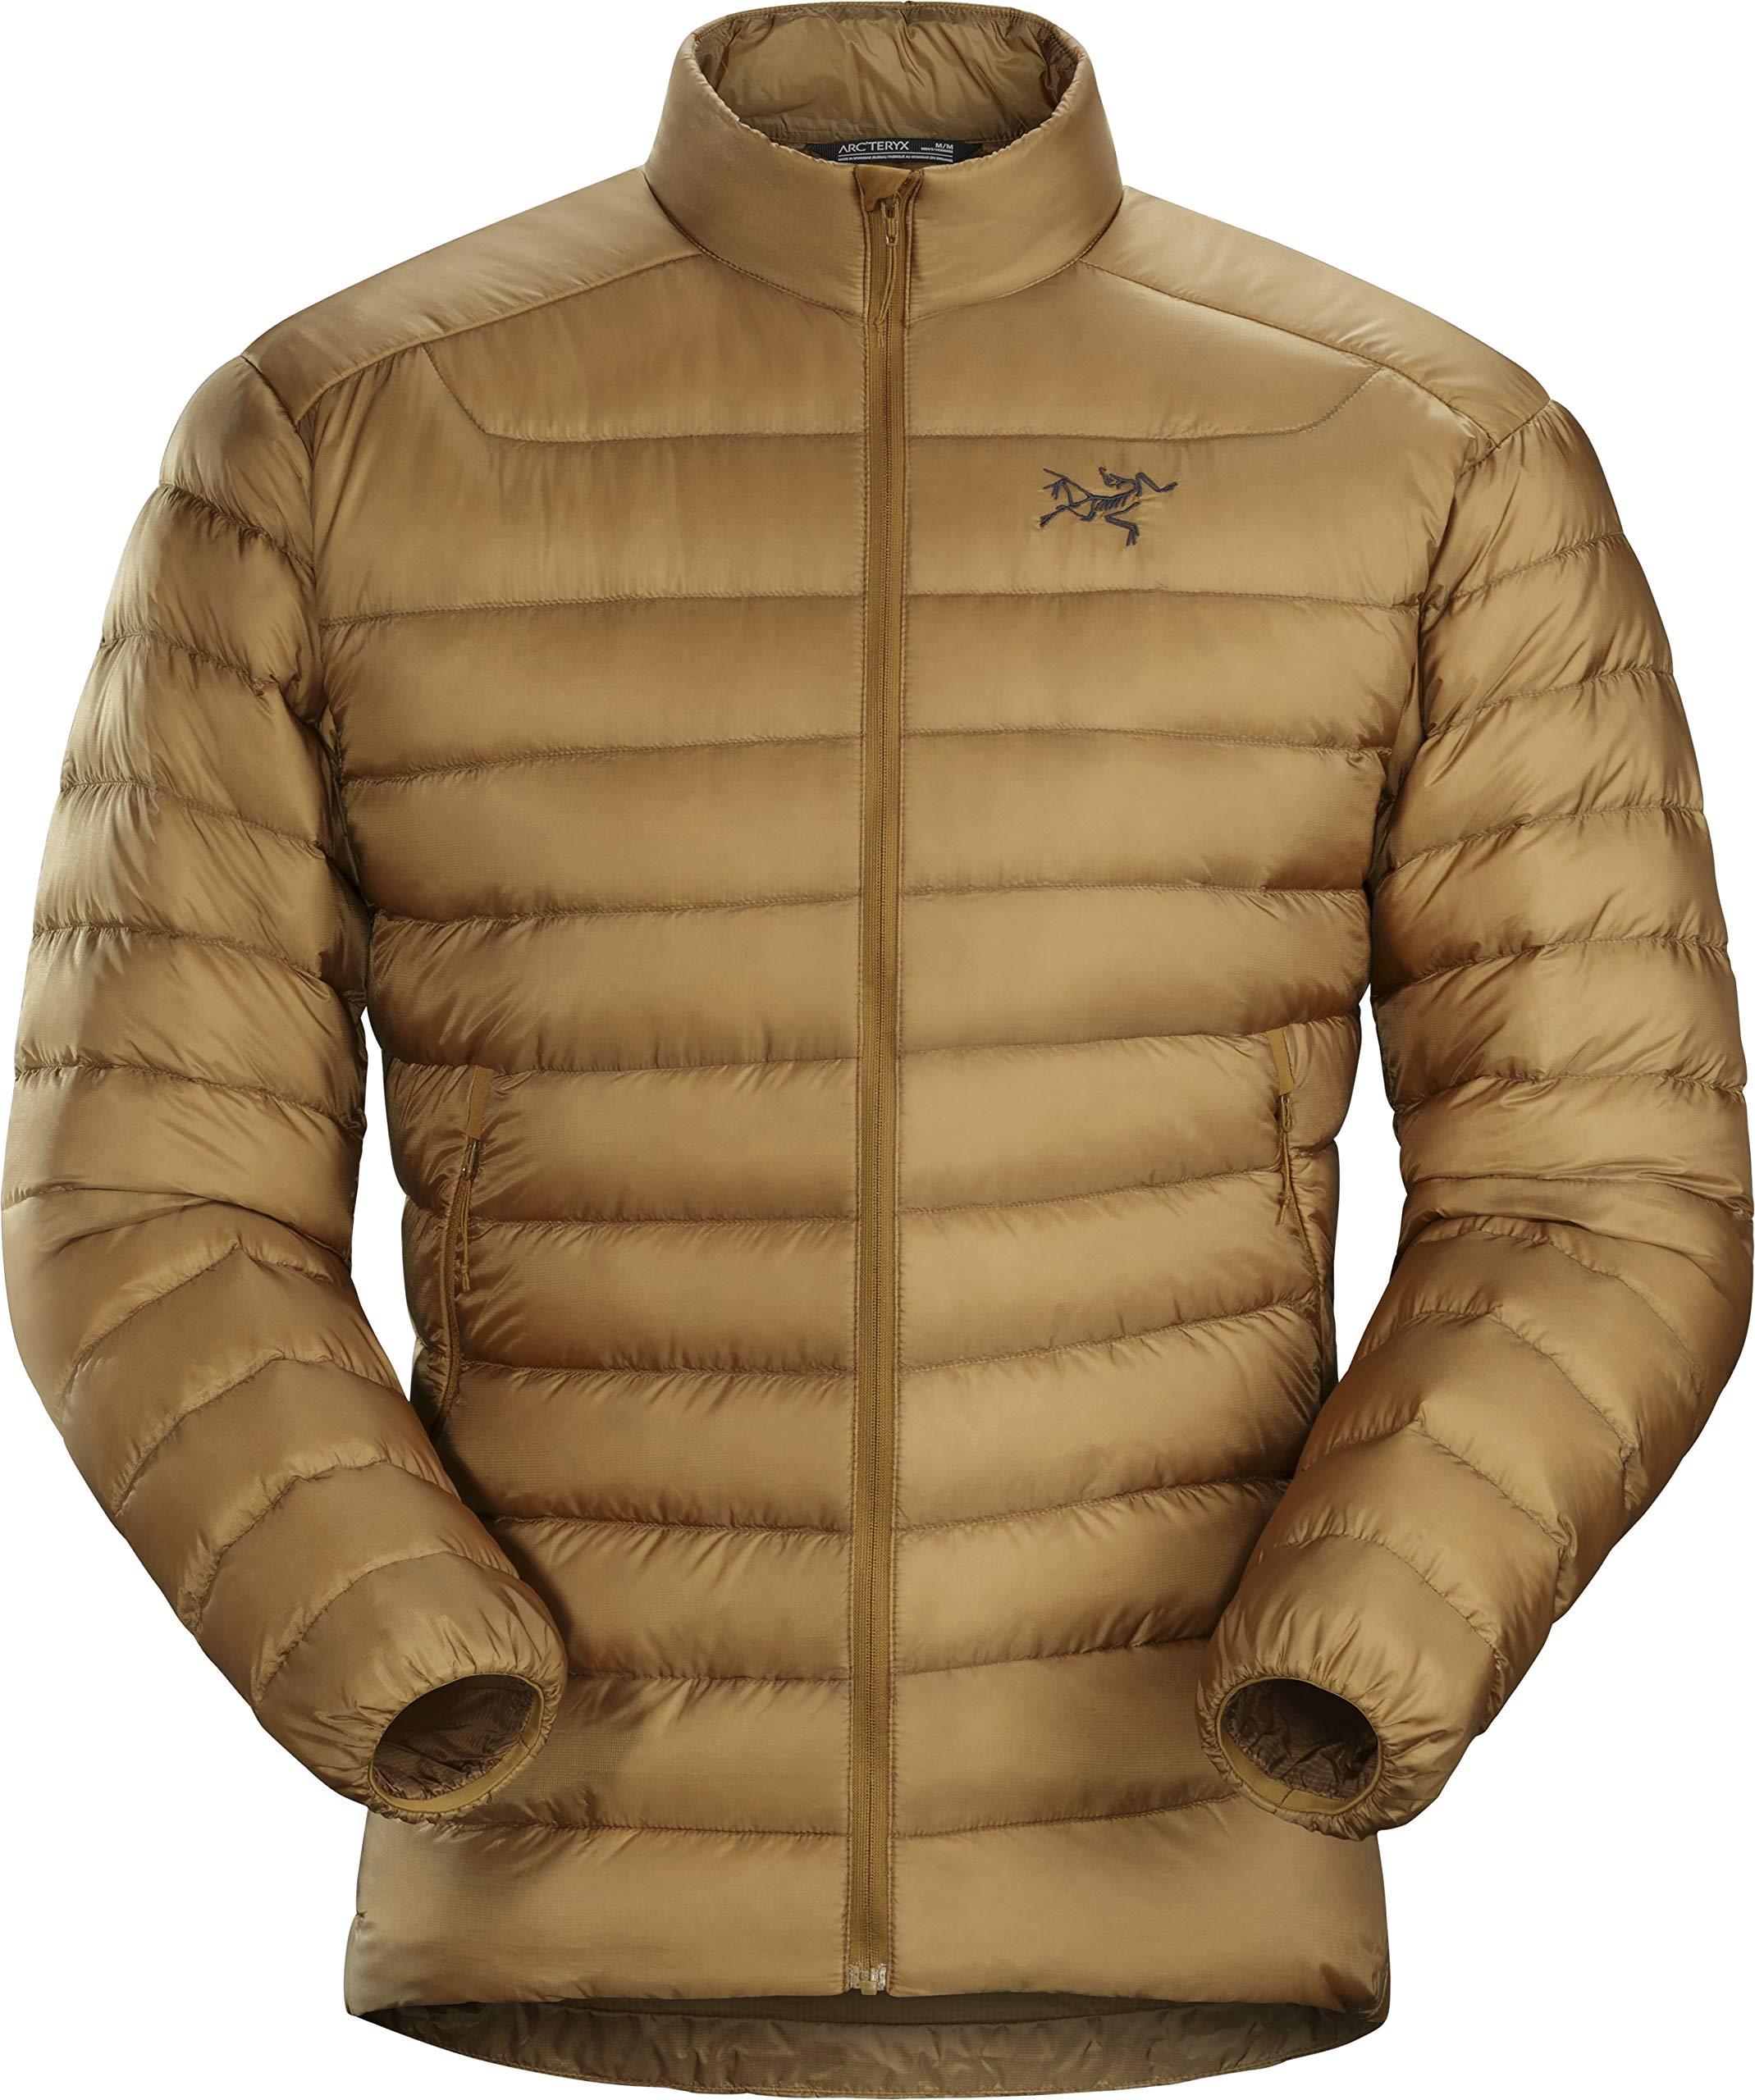 Arc'teryx Cerium LT Jacket Men's (Yukon, Medium) by Arc'teryx